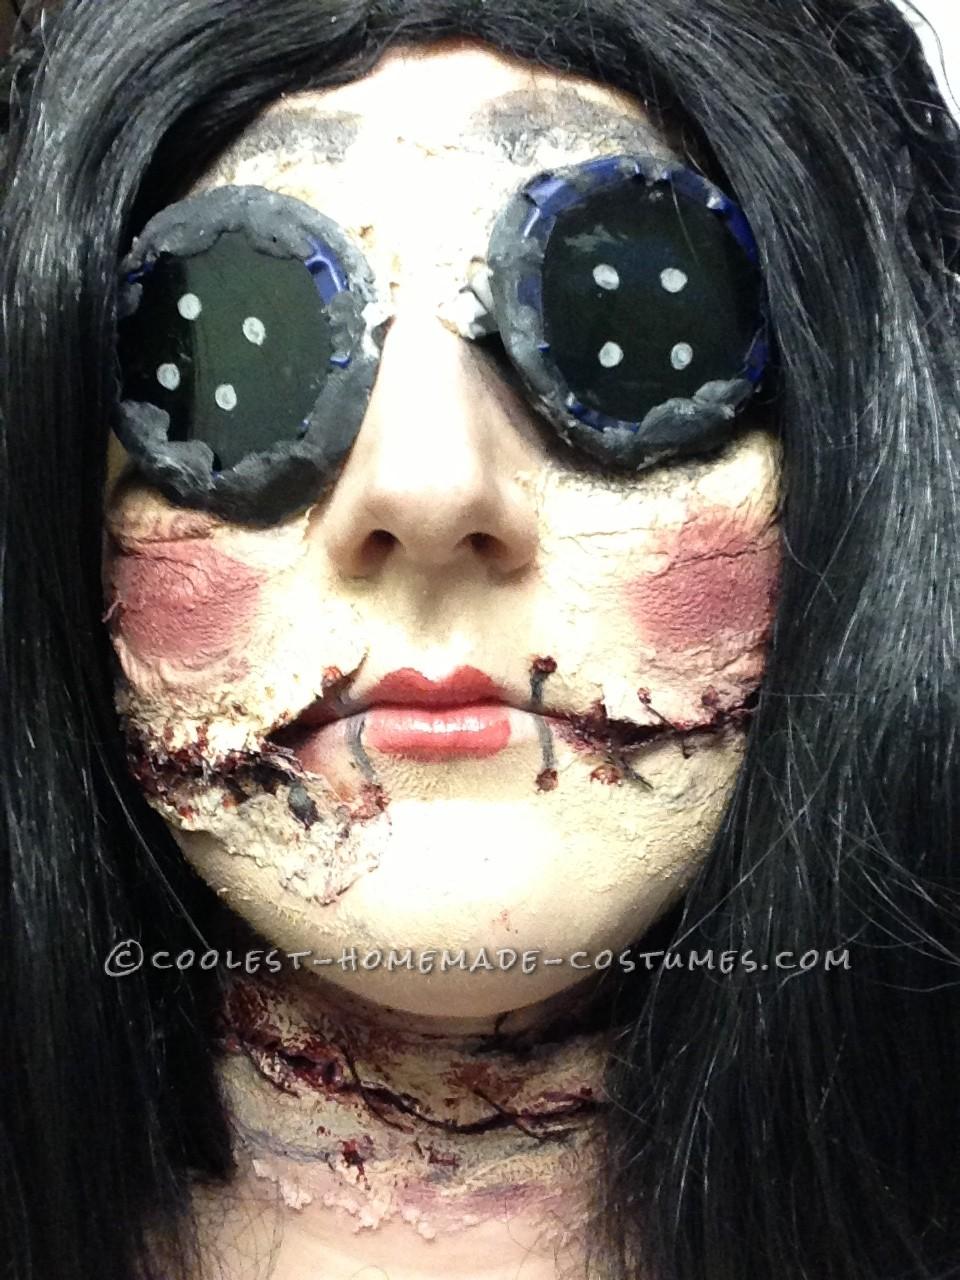 Coraline-Inspired Creepy Doll Costume